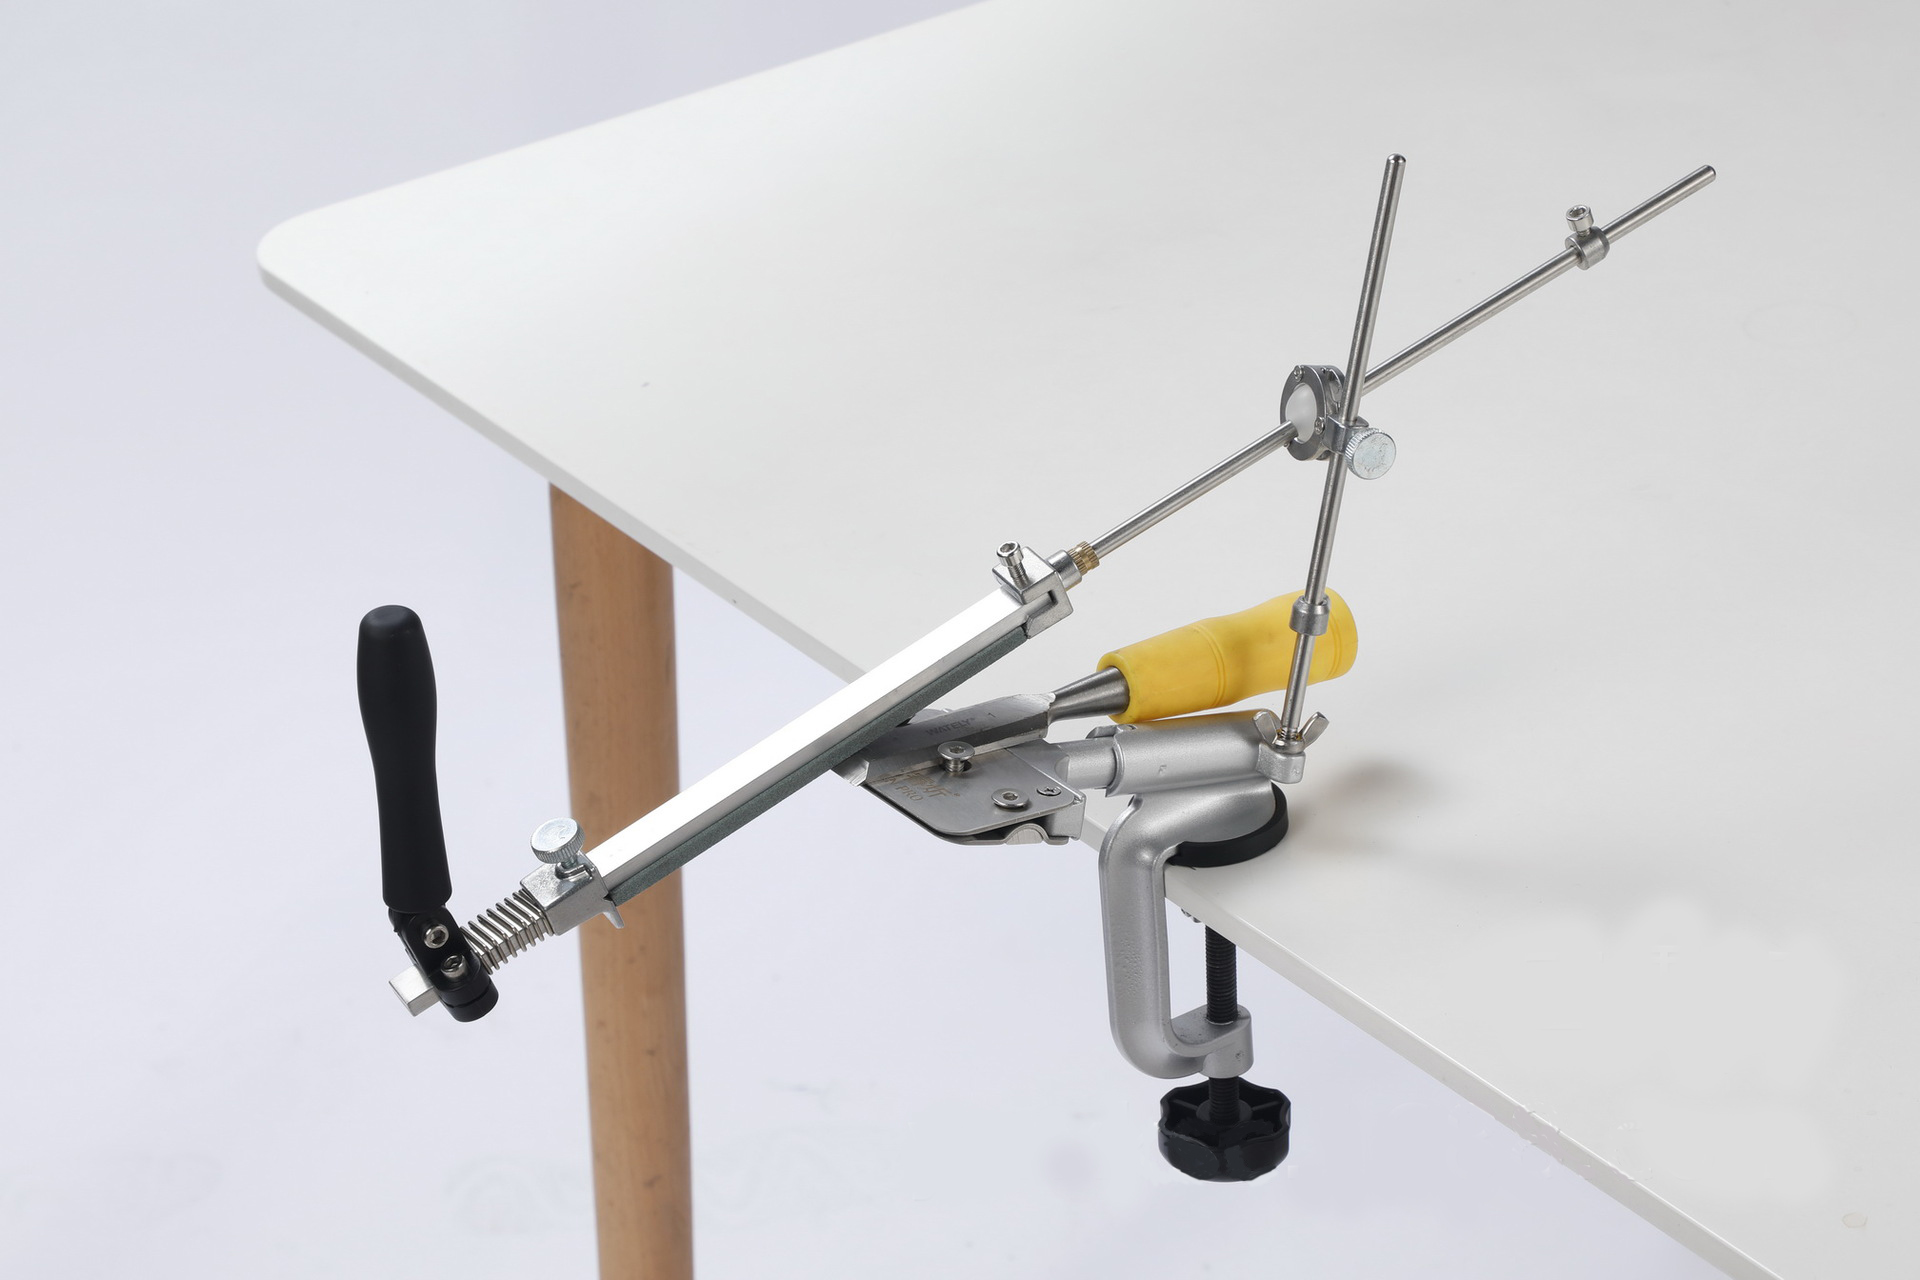 Todos os novos ruixin pro sistema de lâmina de diamante pedra de amolar afiar afiador de facas de pedra de afiar 3000 grit professional